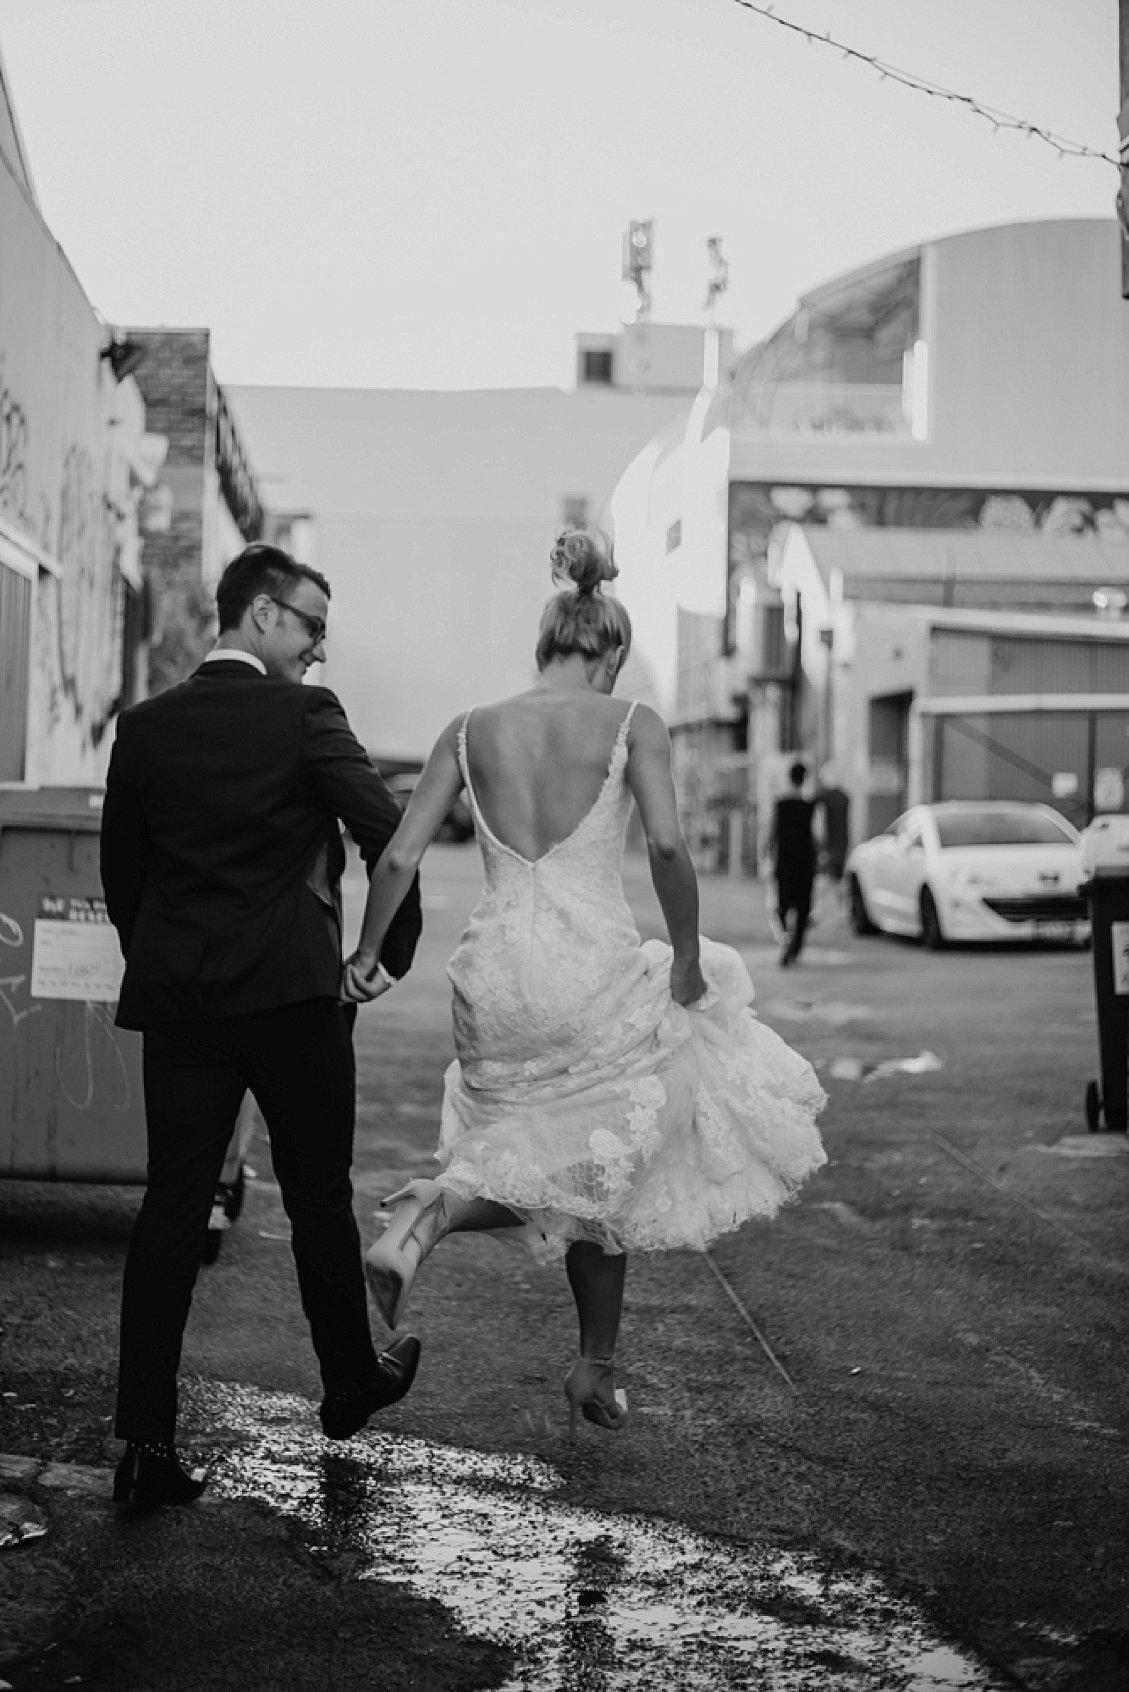 perth-wedding-photographer-art-gallery-industrial_0030.jpg